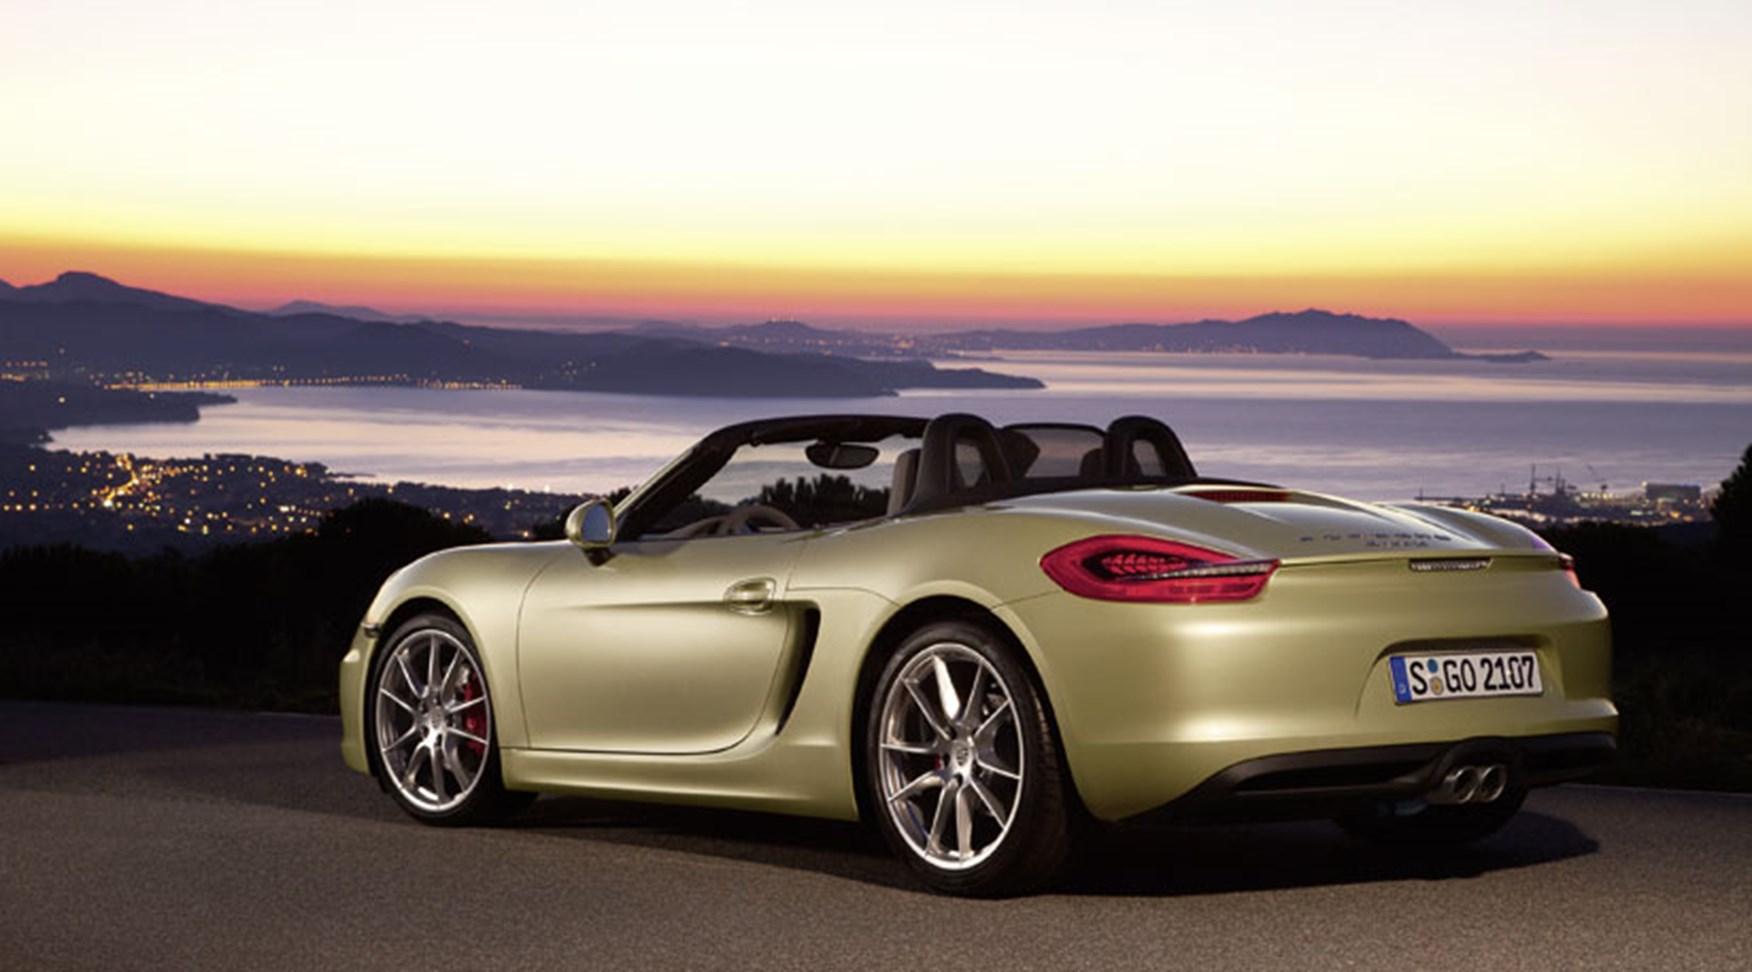 Porsche Boxster S 2012 Review By Car Magazine